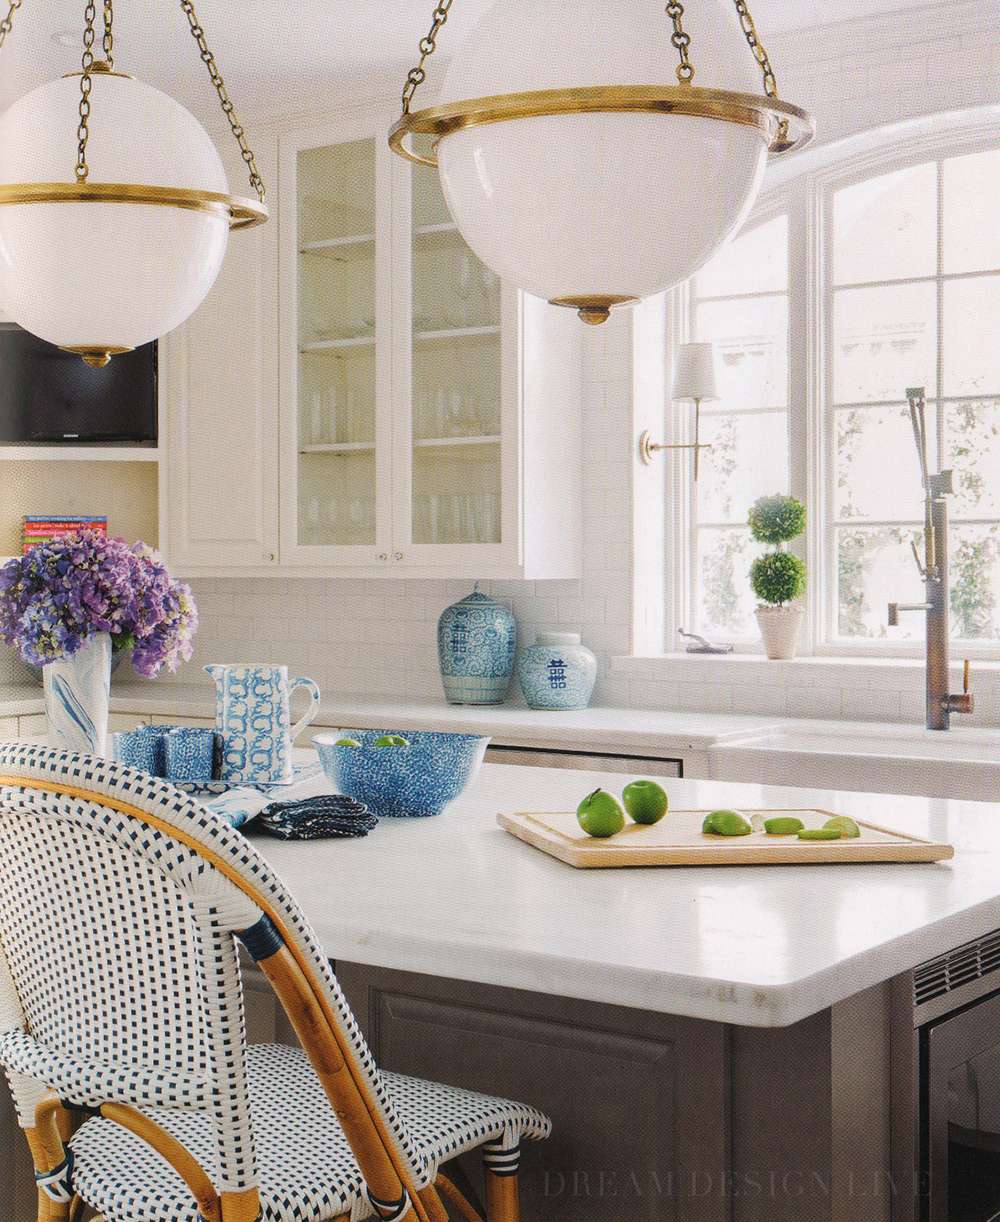 Gorgeous blue and white kitchen from Dream Design Live, Paloma Contreras' fantastic new interior design book